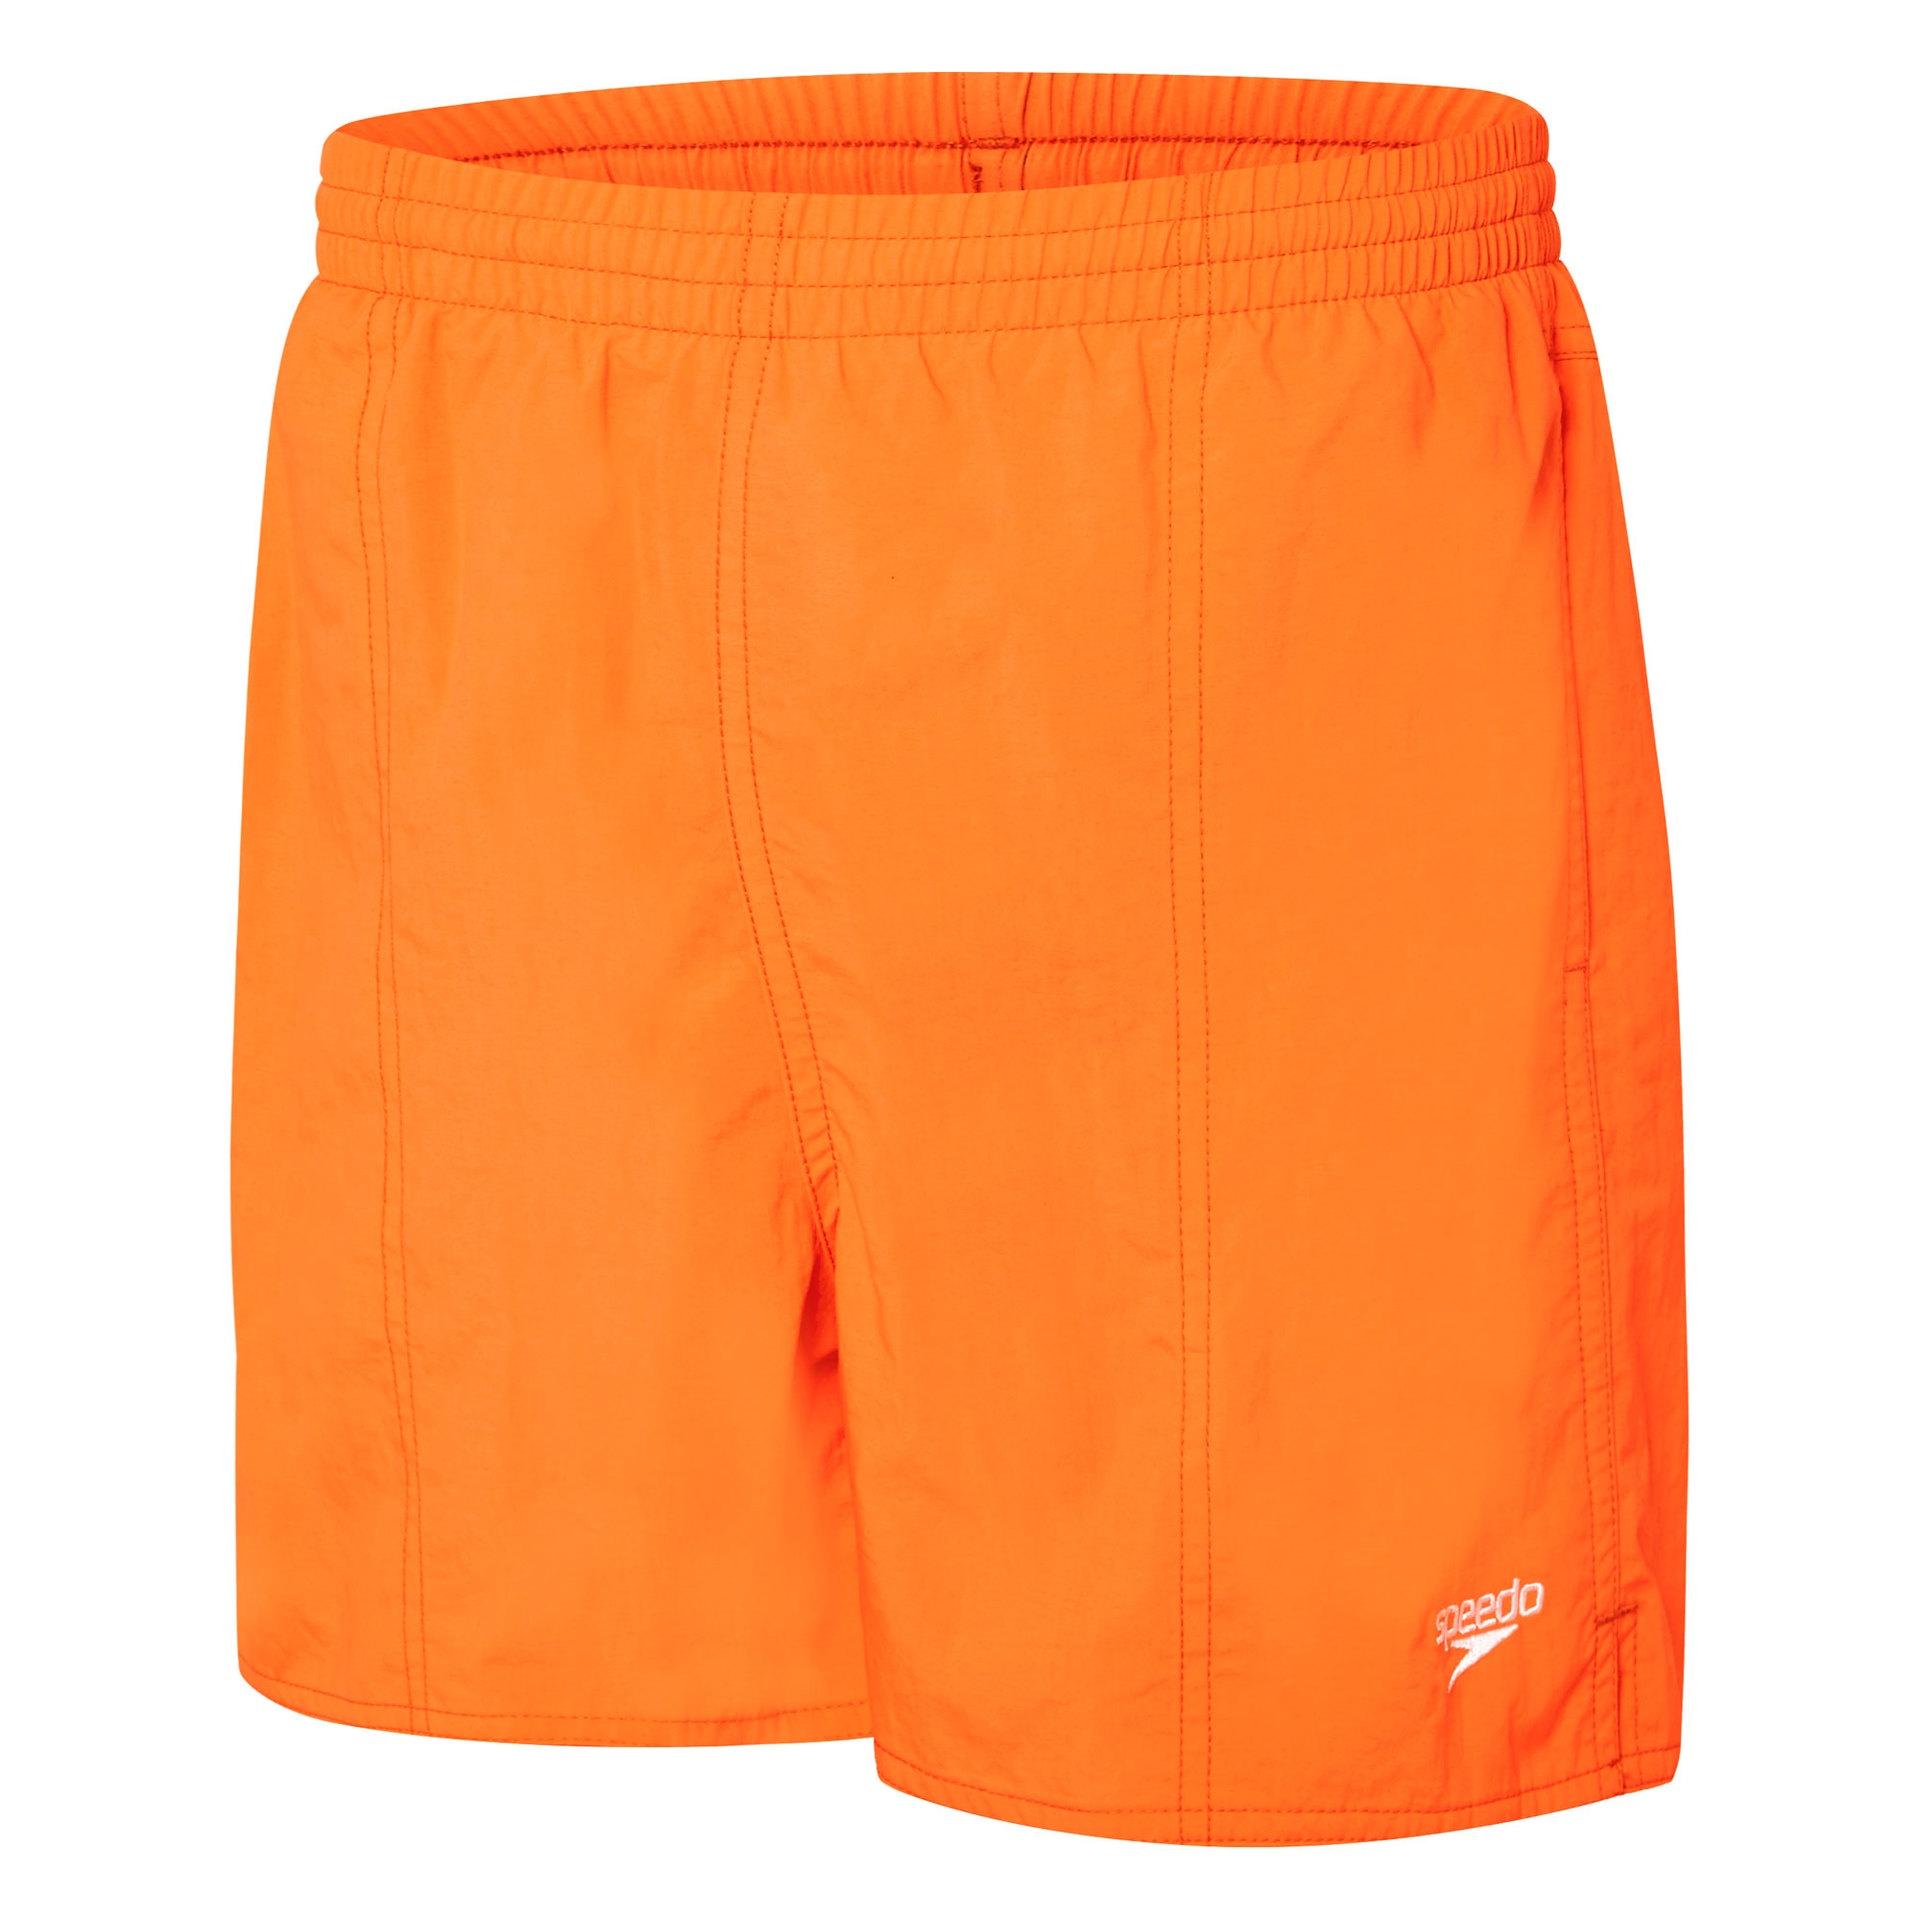 Boys Solid Leisure Vivid Orange